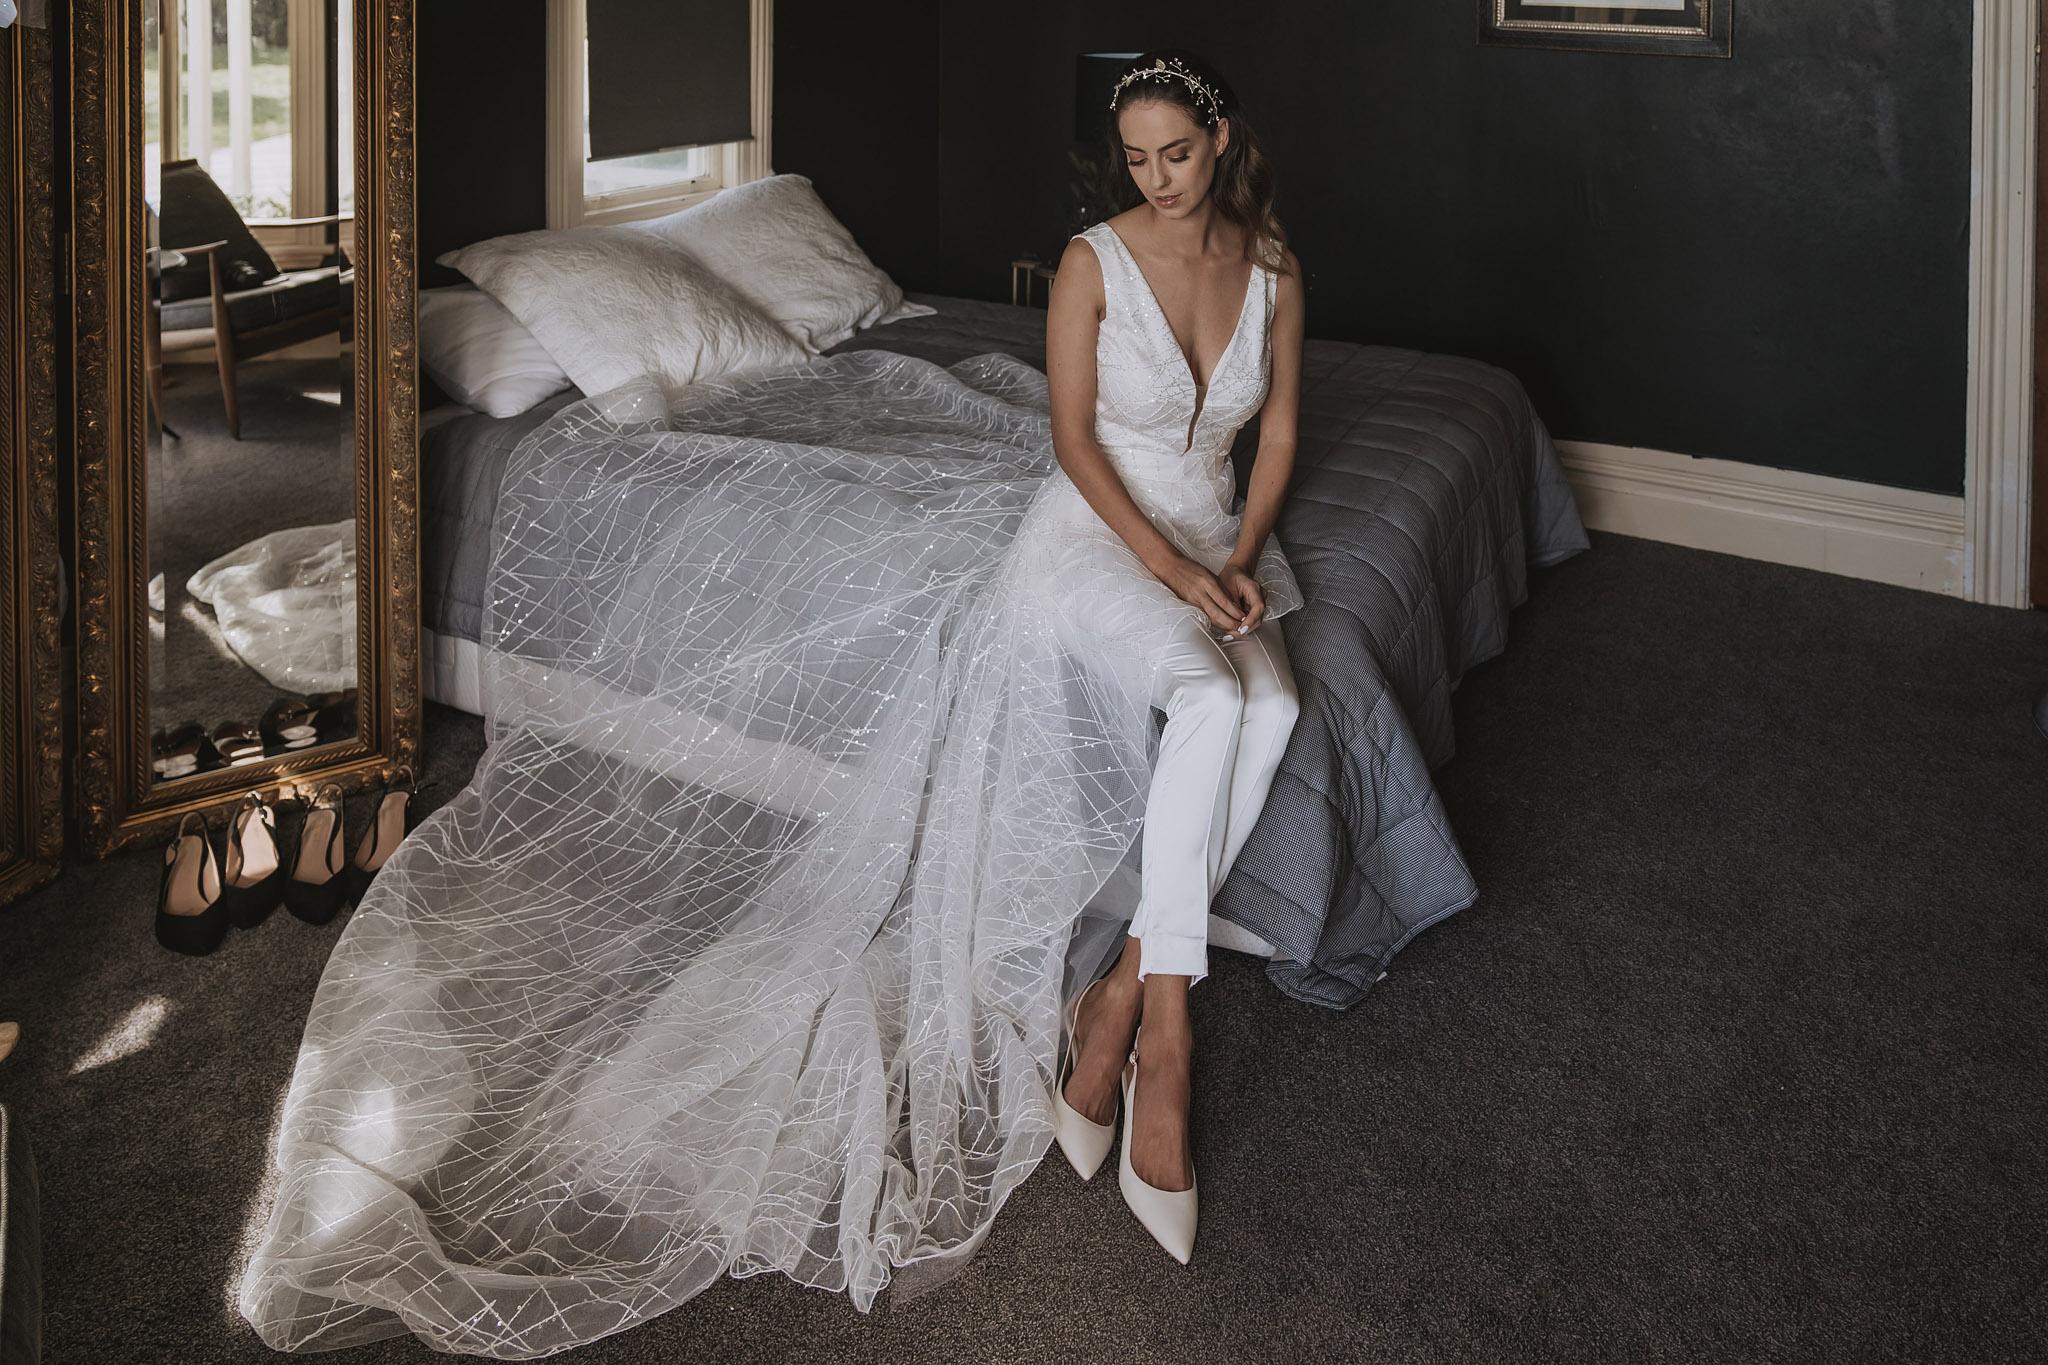 rambo-estrada-rubymatt-kauri-bay-boomrock-auckland-wedding-photographers-0145-c copy.jpg